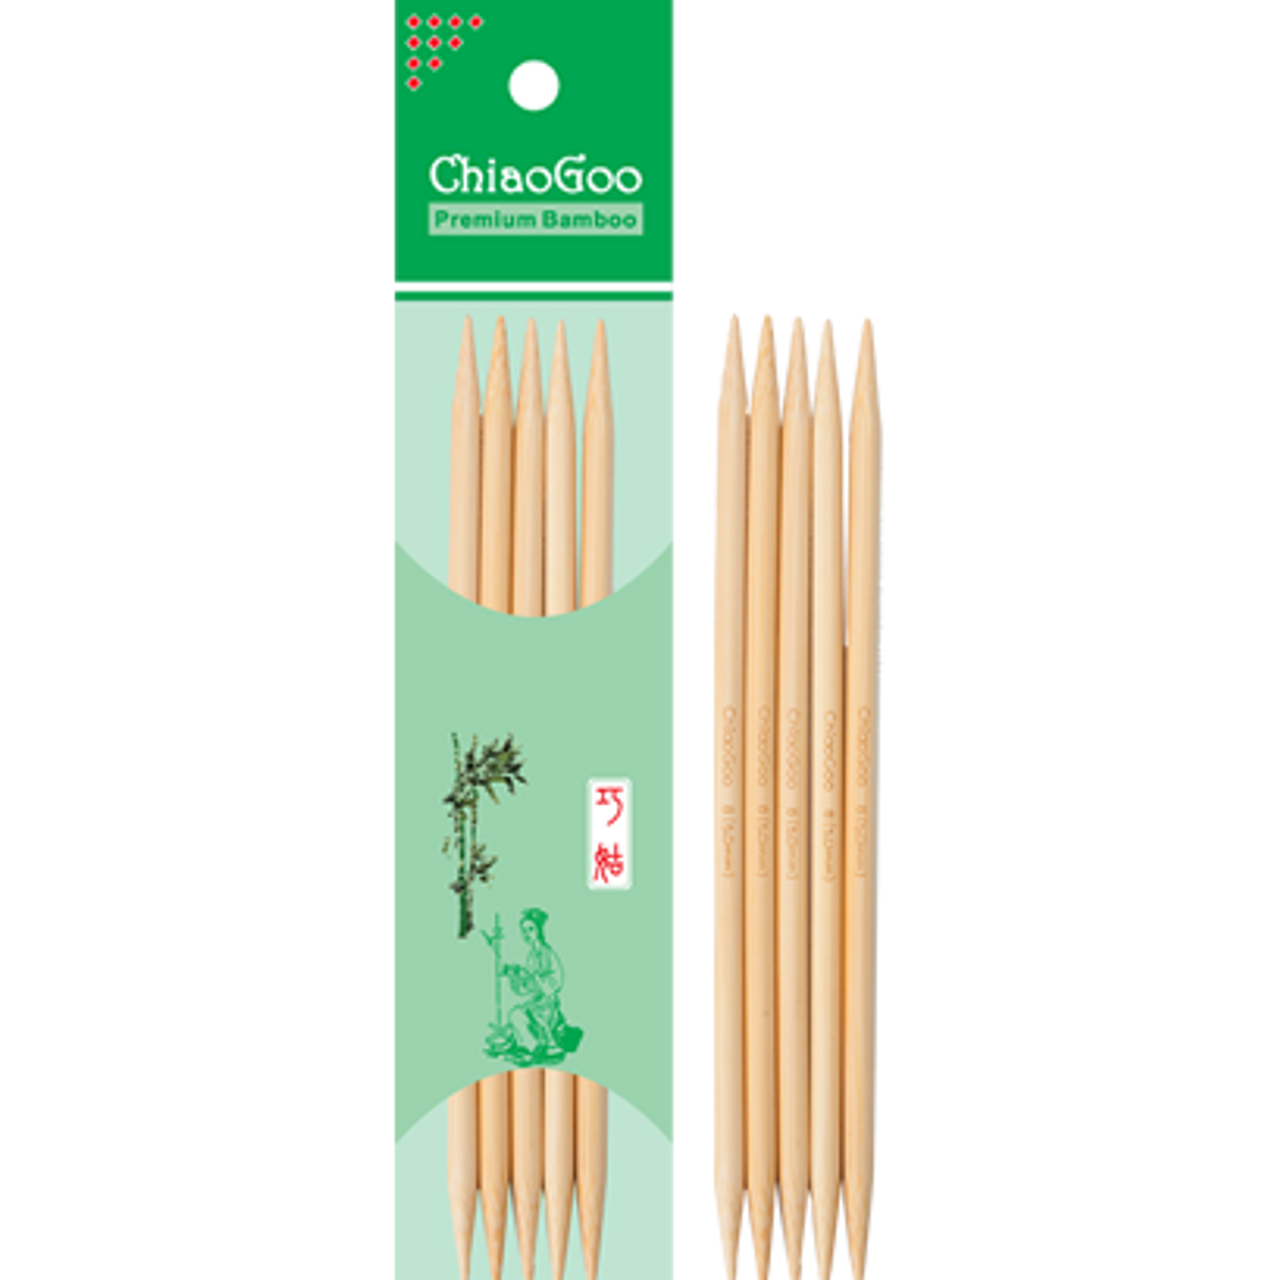 ChiaoGoo Double Point Bamboo